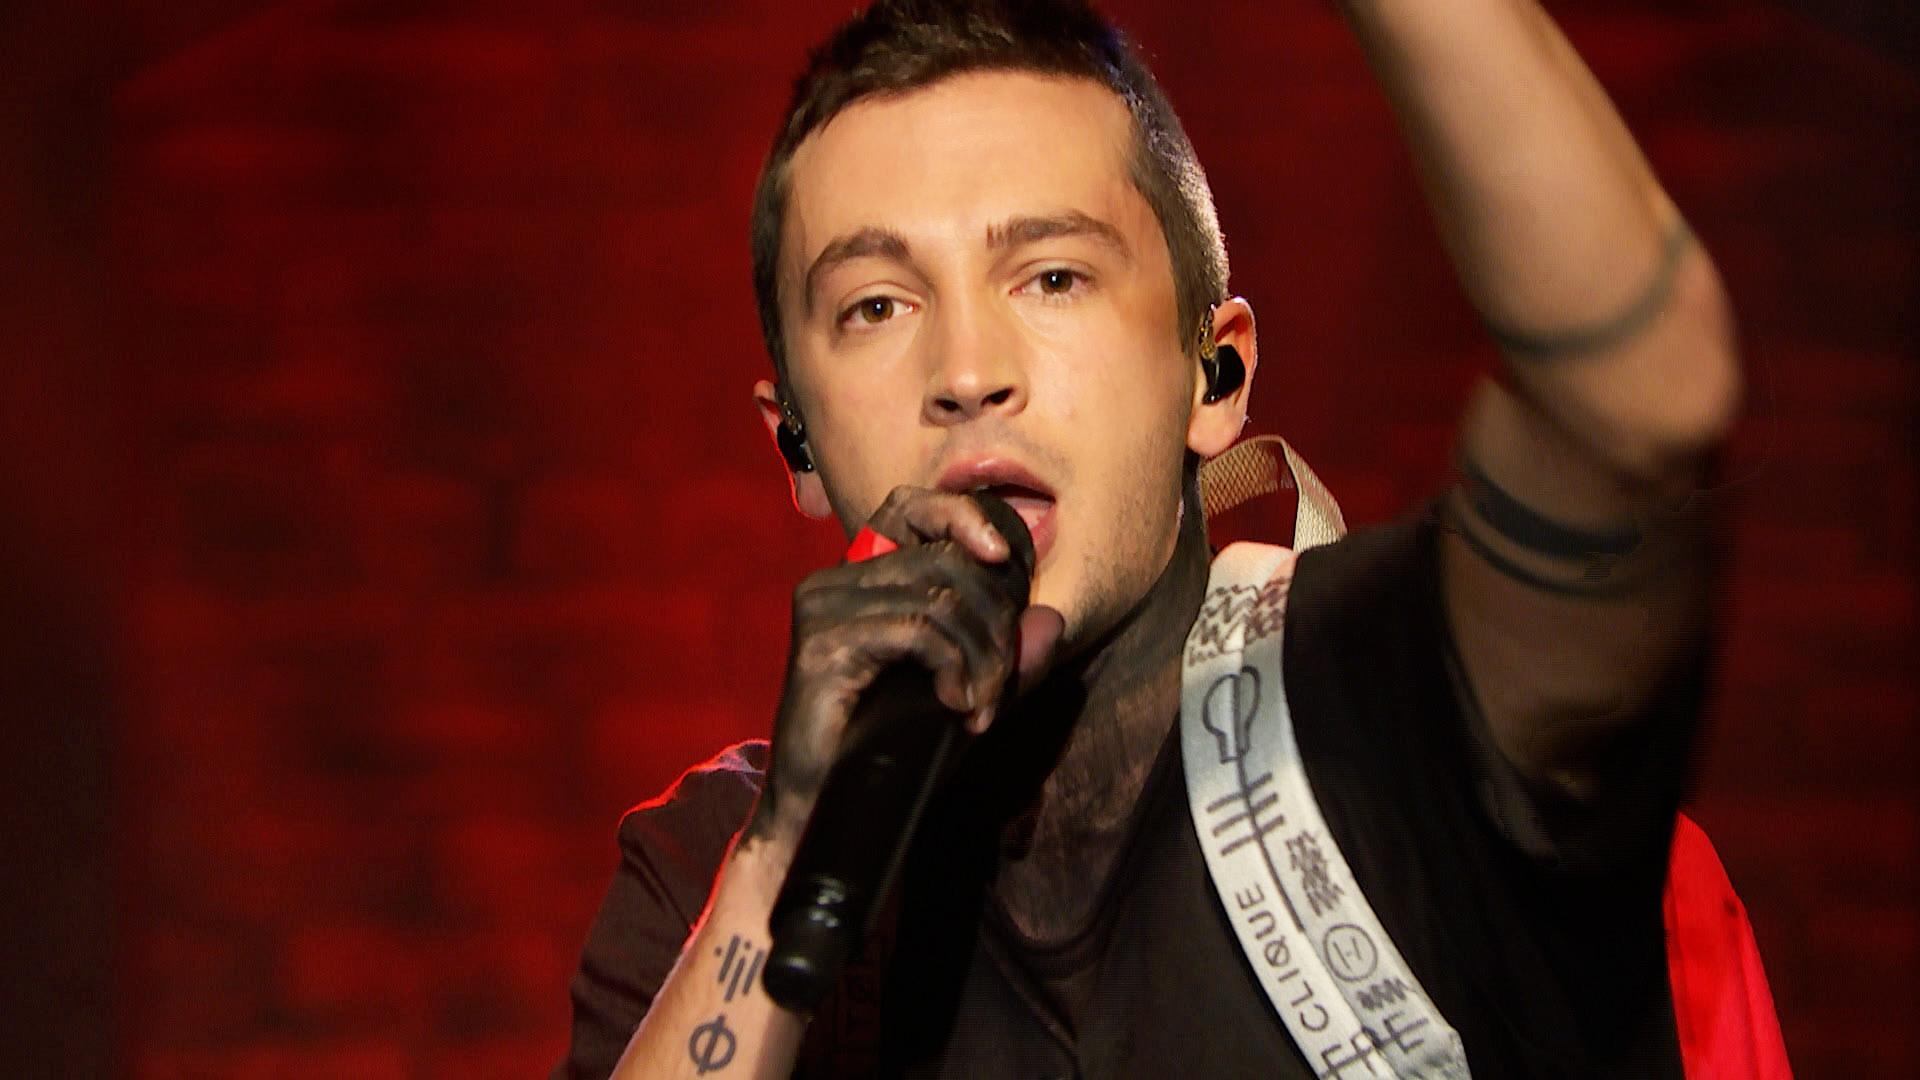 Top tyler joseph neck images for pinterest tattoos for Twenty pictures